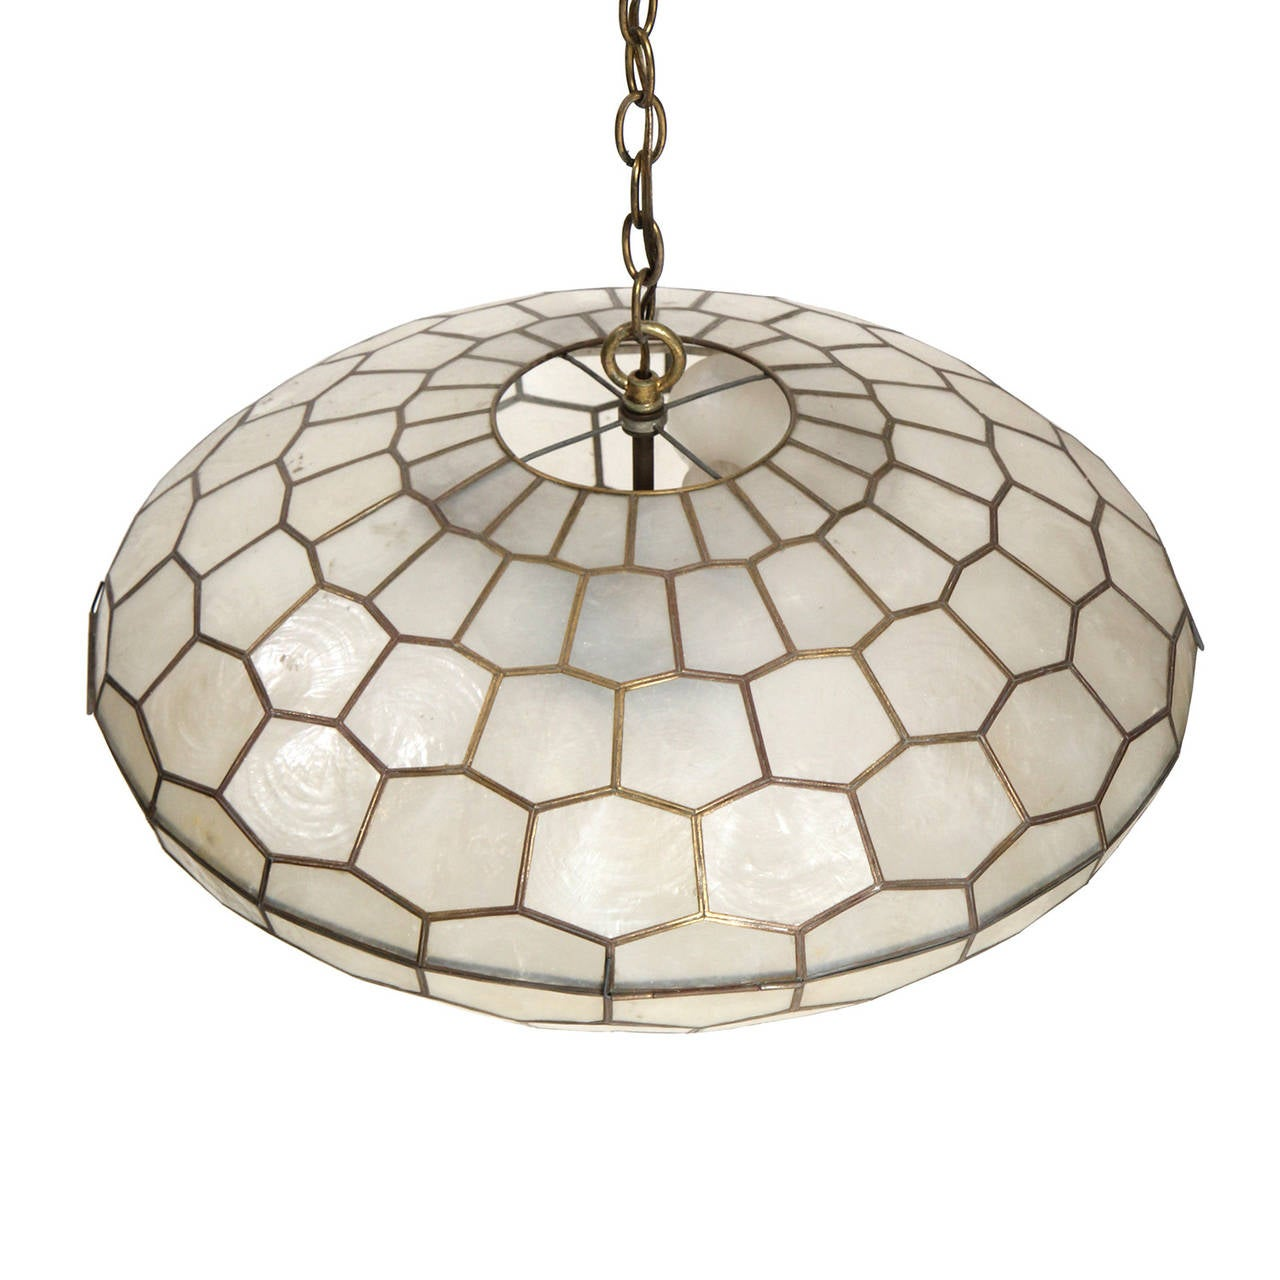 Capiz shell chandelier at 1stdibs for Shell ceiling light fixtures